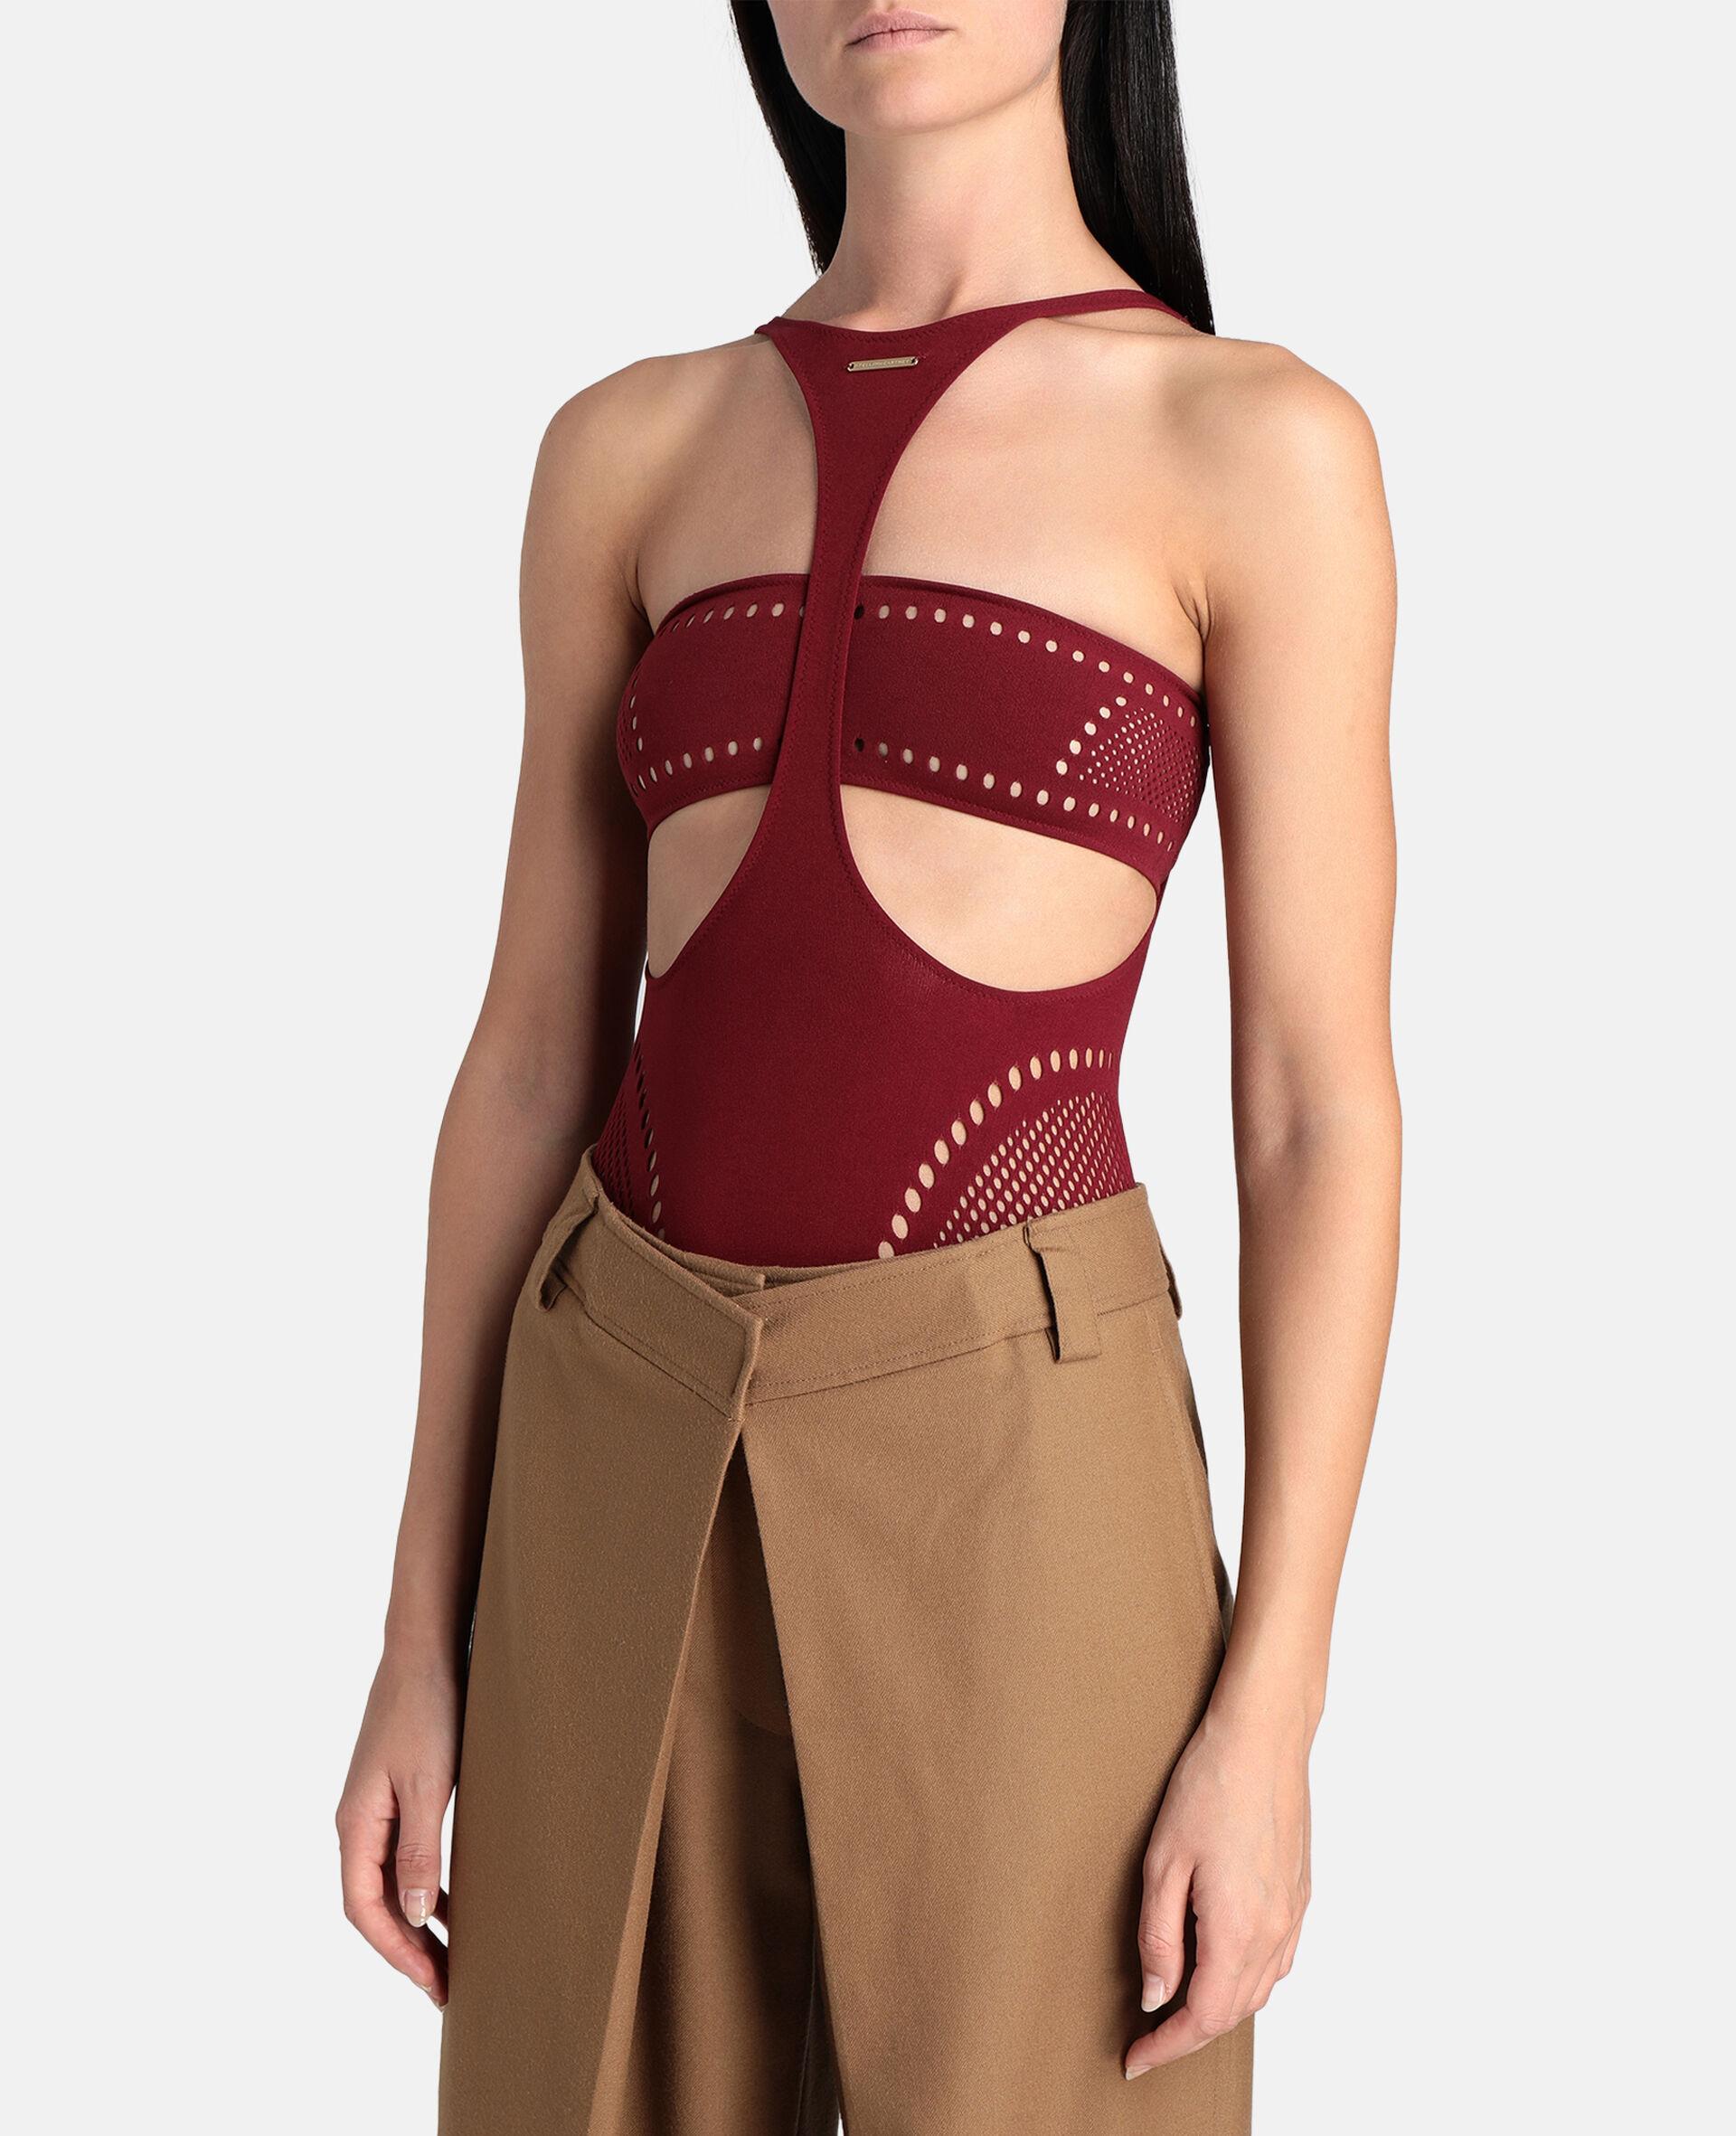 Grafischer Body Stellawear-Rose-large image number 3